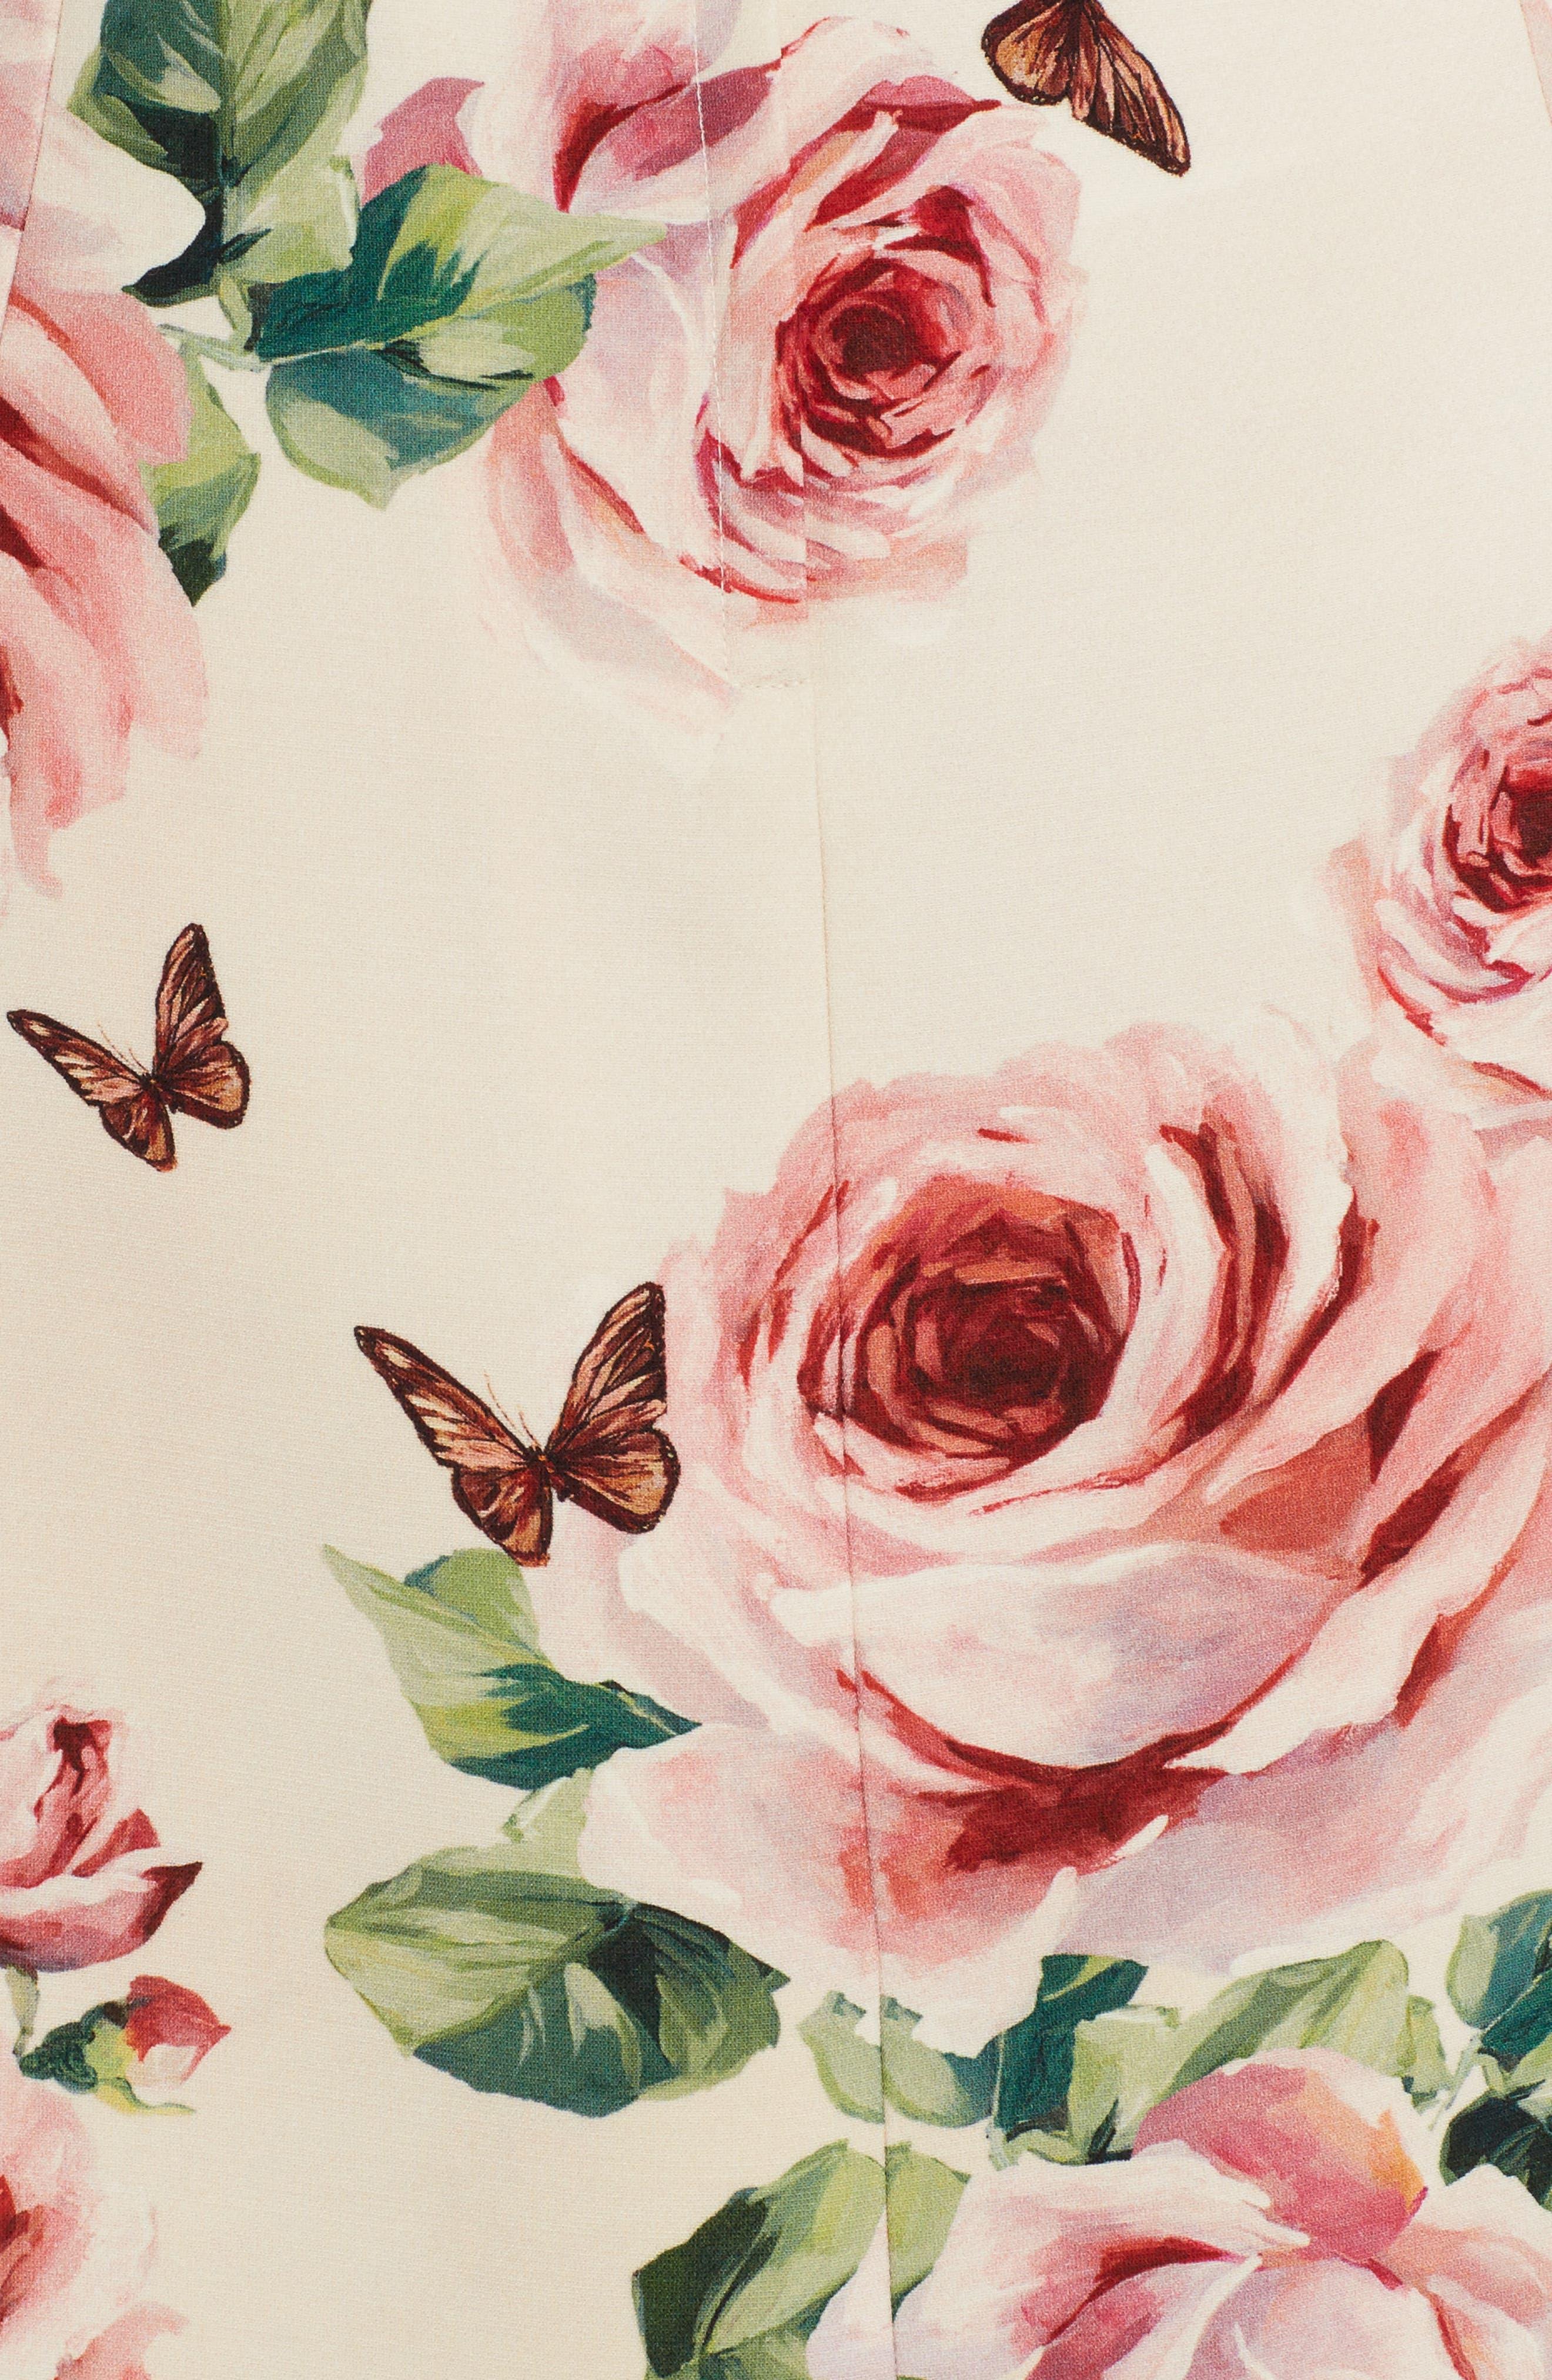 Rose Print Wool & Silk Shift Dress,                             Alternate thumbnail 5, color,                             680